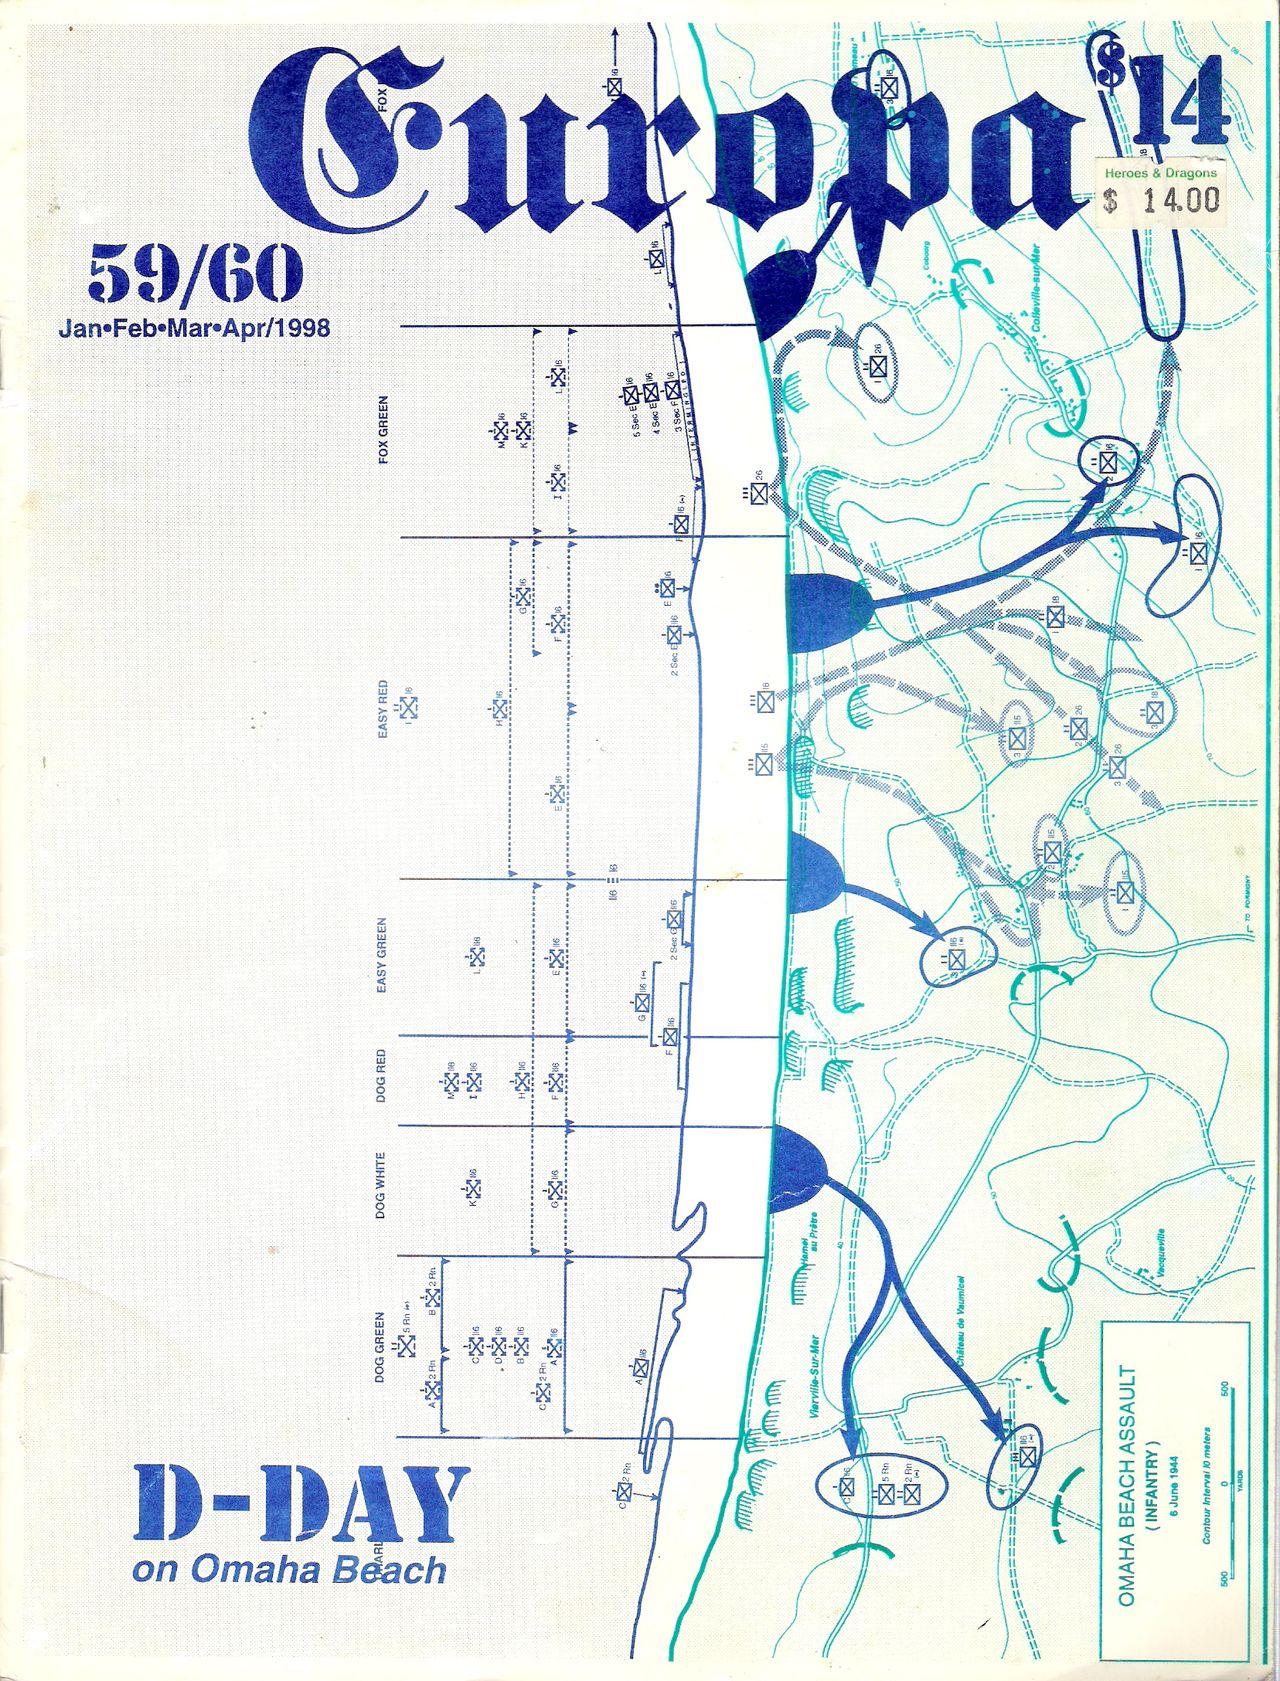 The Europa Magazine #59/60 - Cover